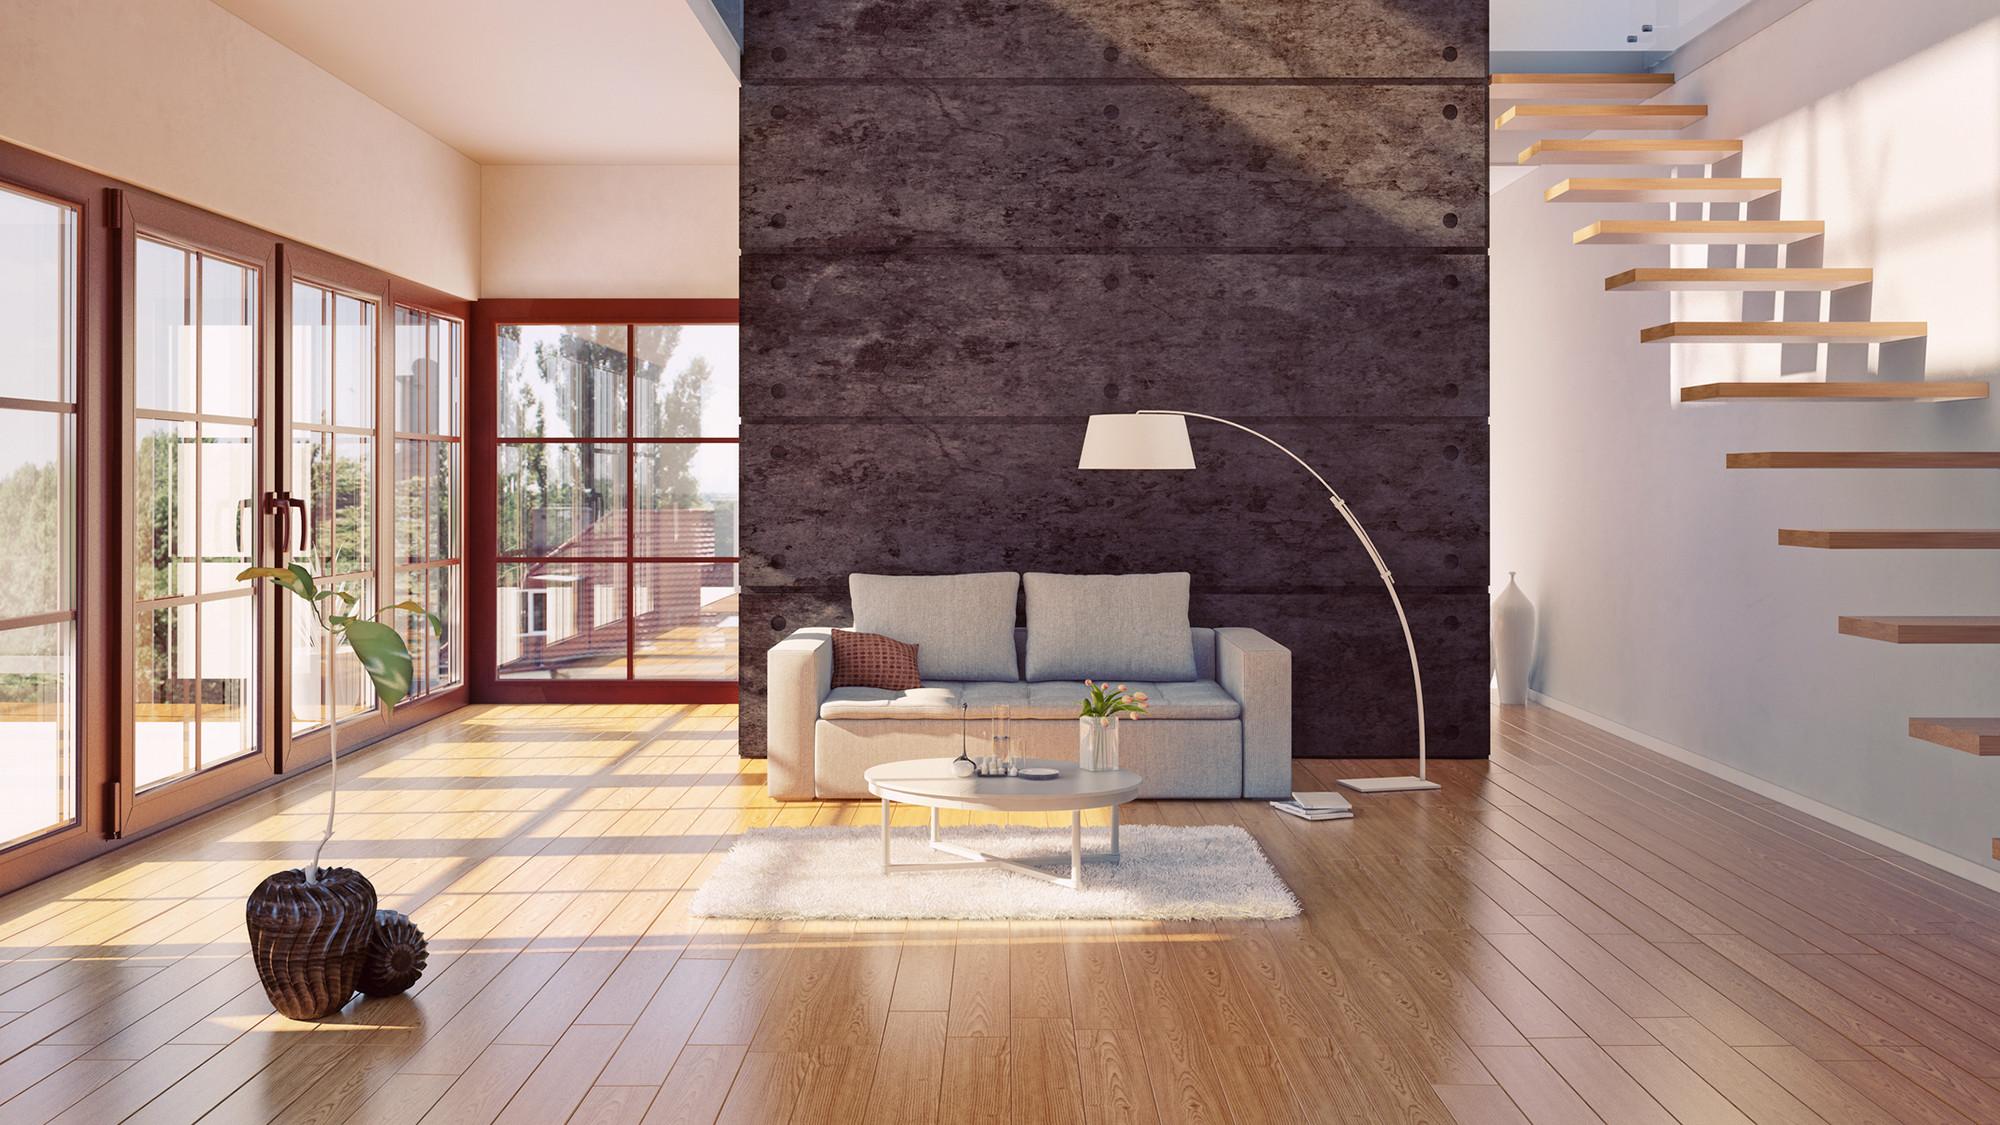 how to restore hardwood floors under carpet of do hardwood floors provide the best return on investment realtor coma throughout hardwood floors investment